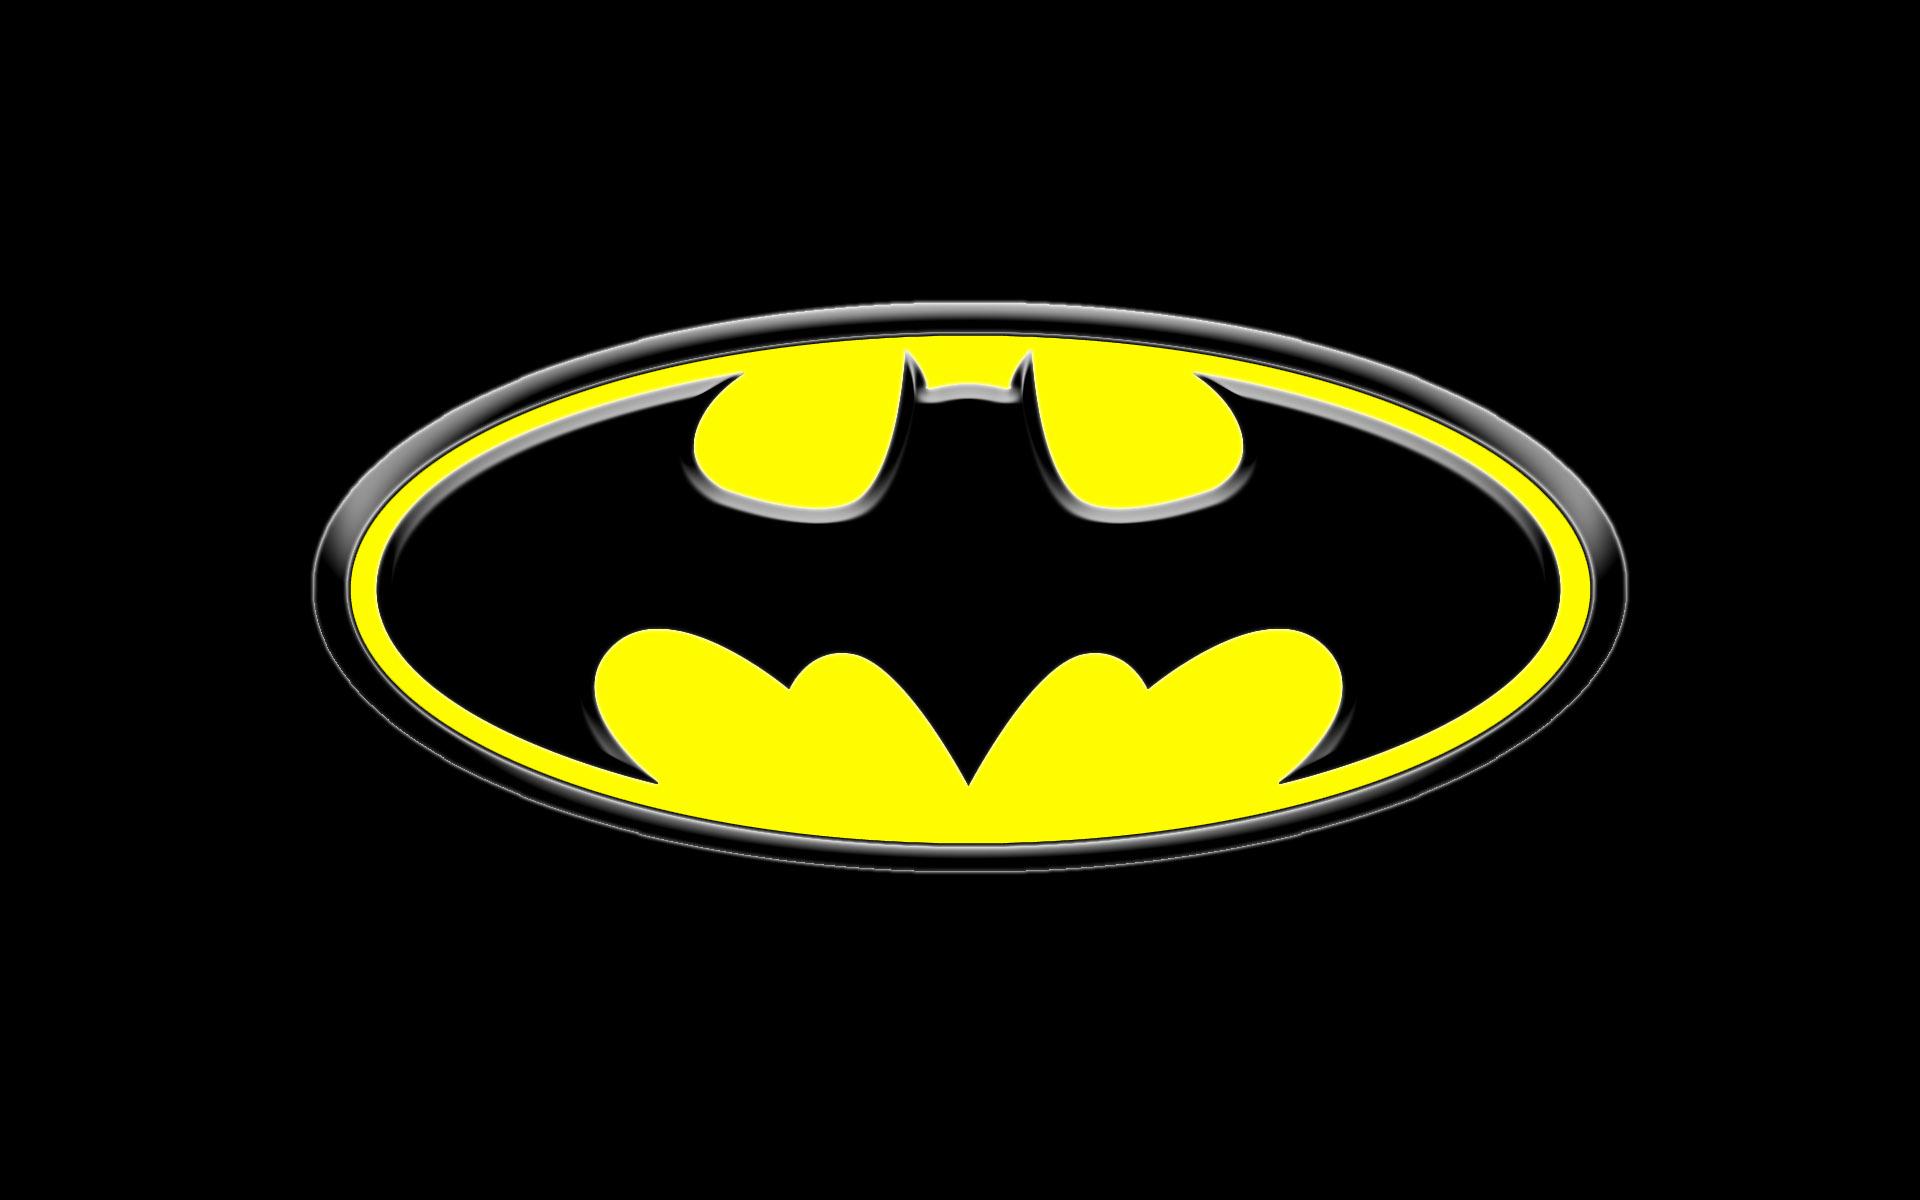 Dessins En Couleurs Imprimer Batman Numro 91857